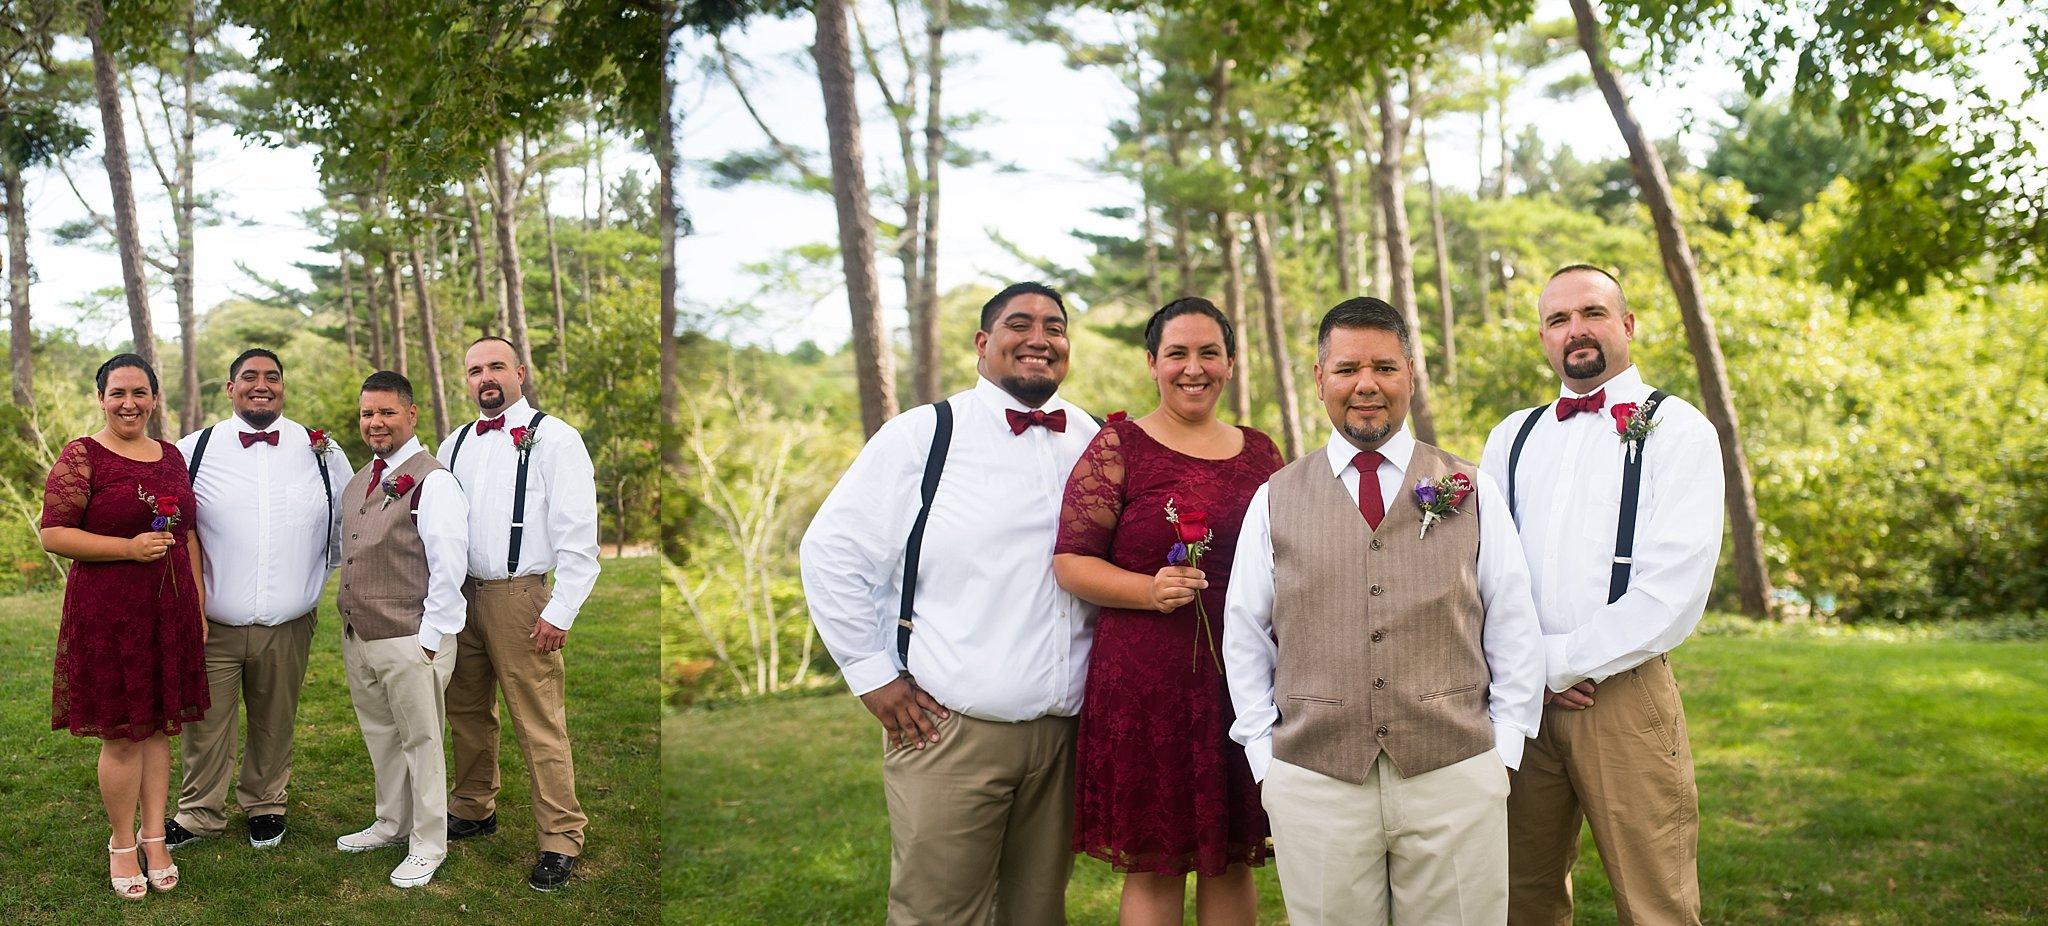 new england wedding photographer 3.jpg